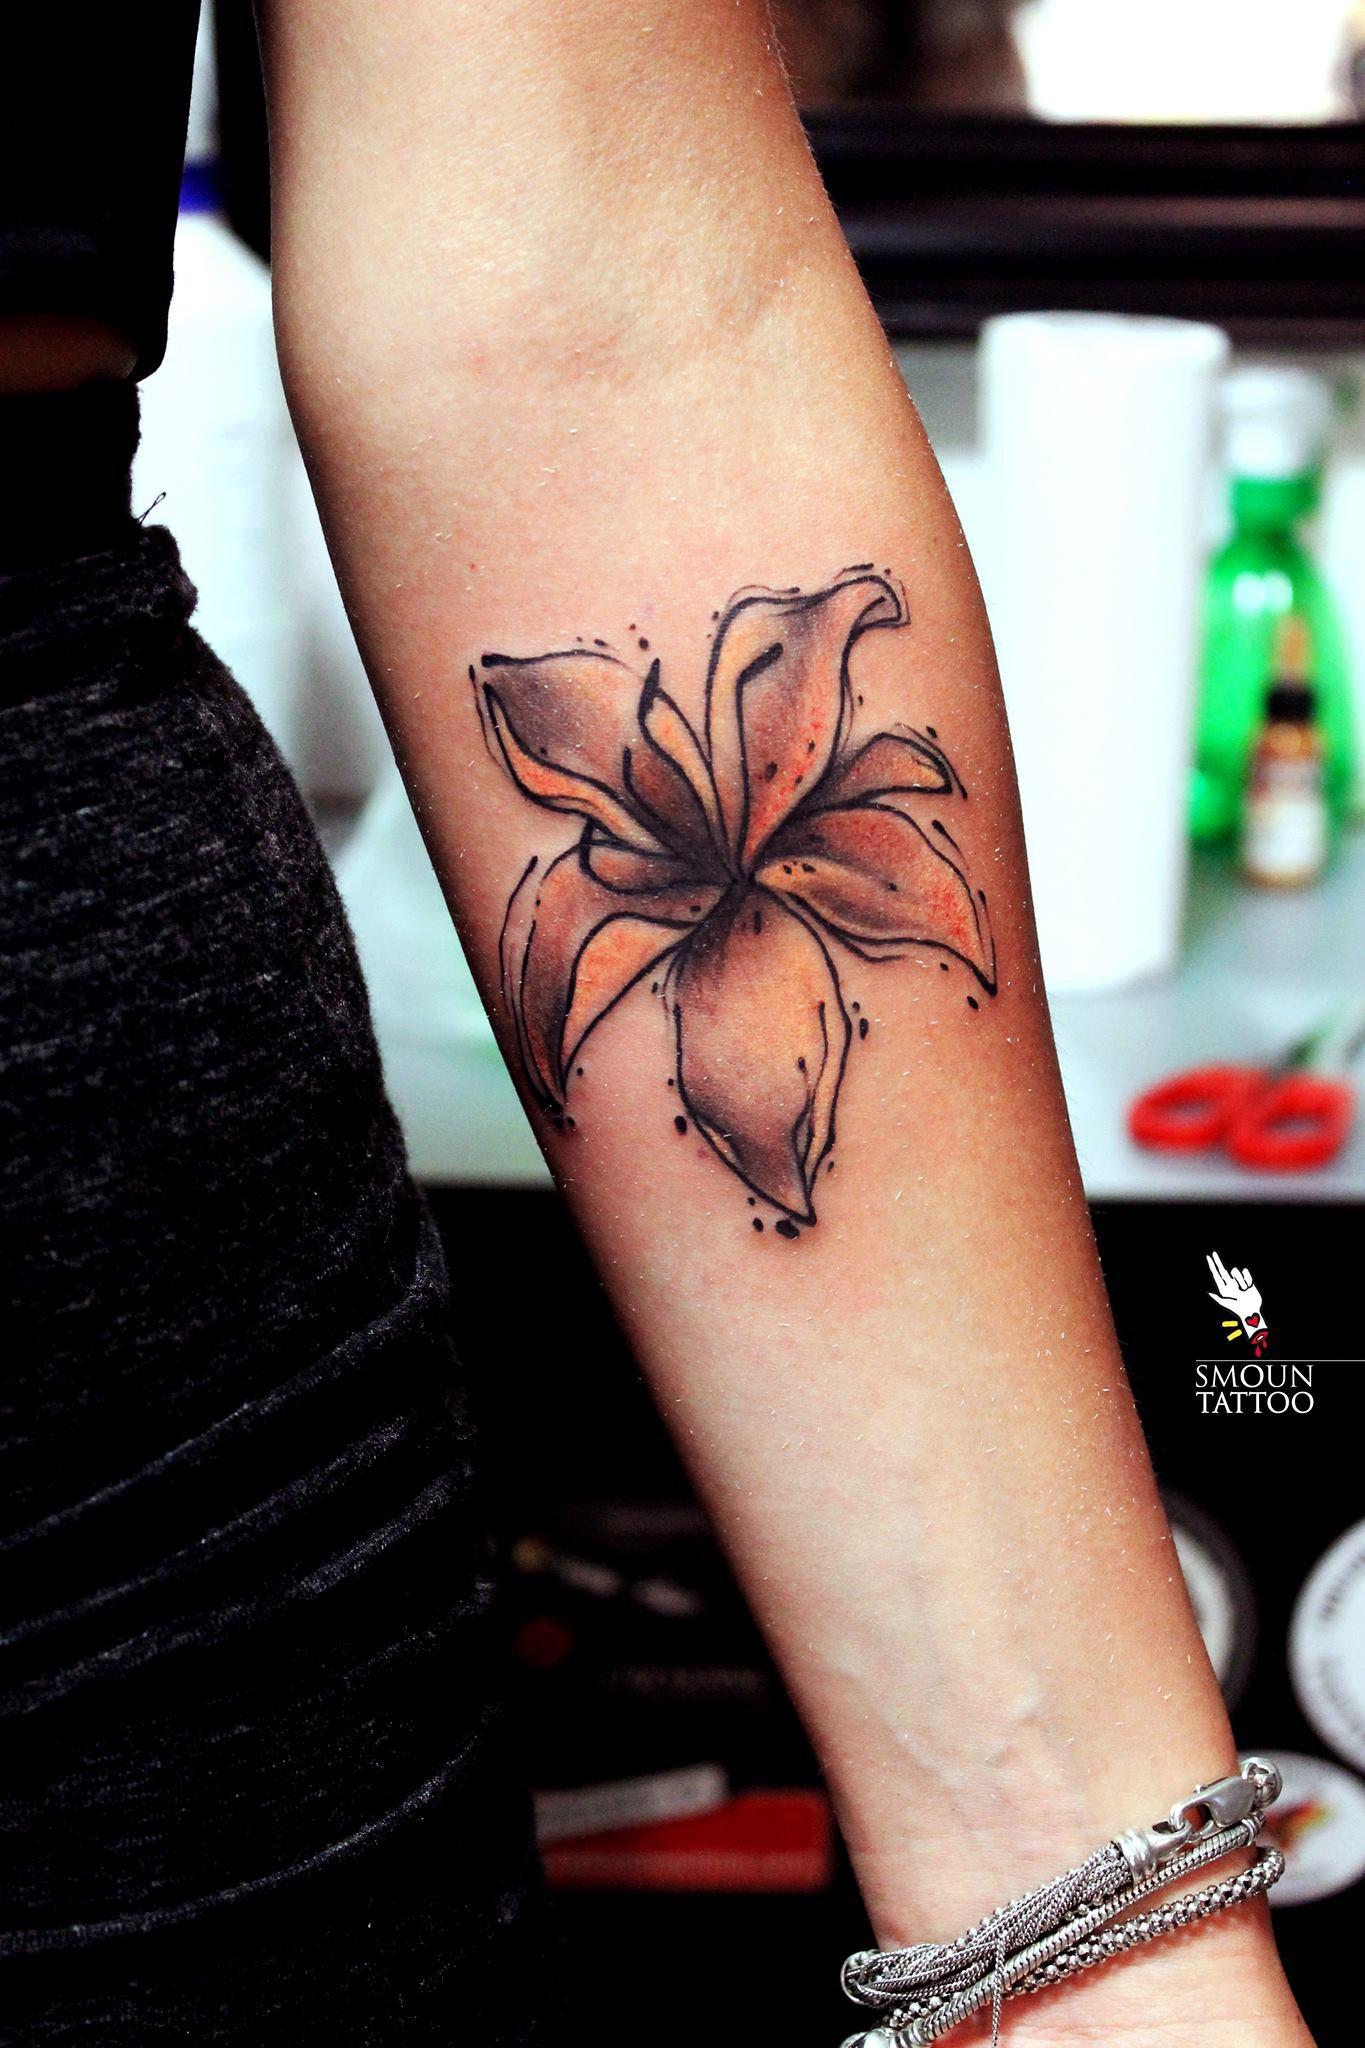 Crezioni Smoun Tattoo Bari